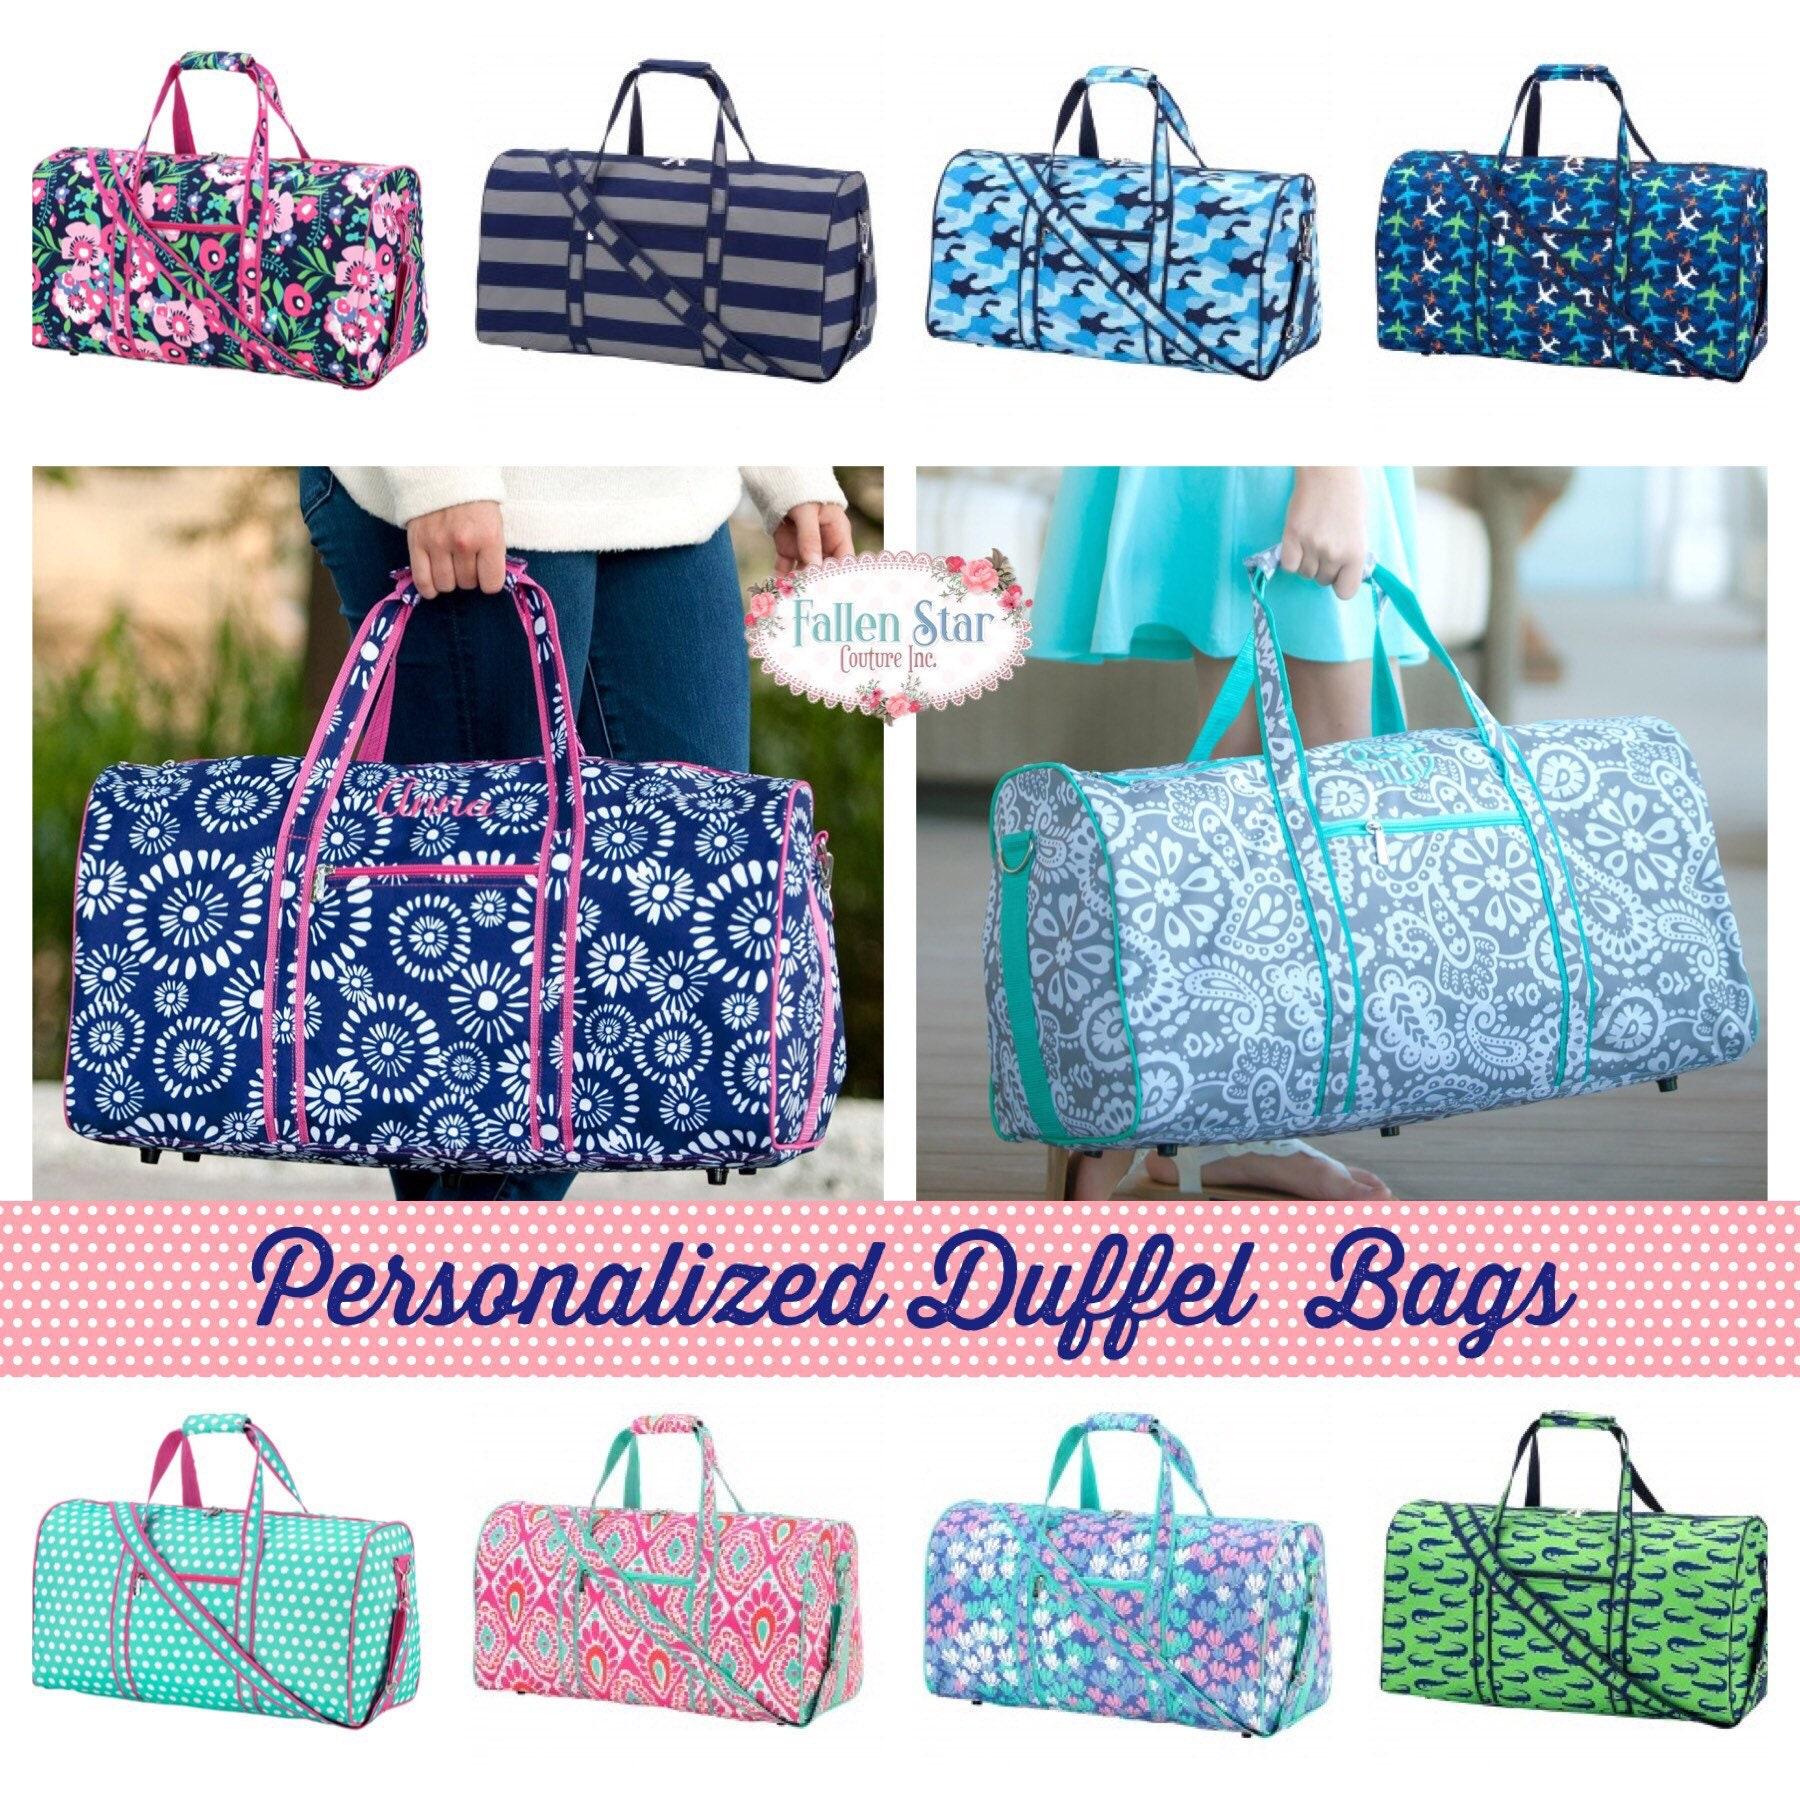 10d89d10f7 Kids Duffle Personalized Weekender Bag Duffle bag going